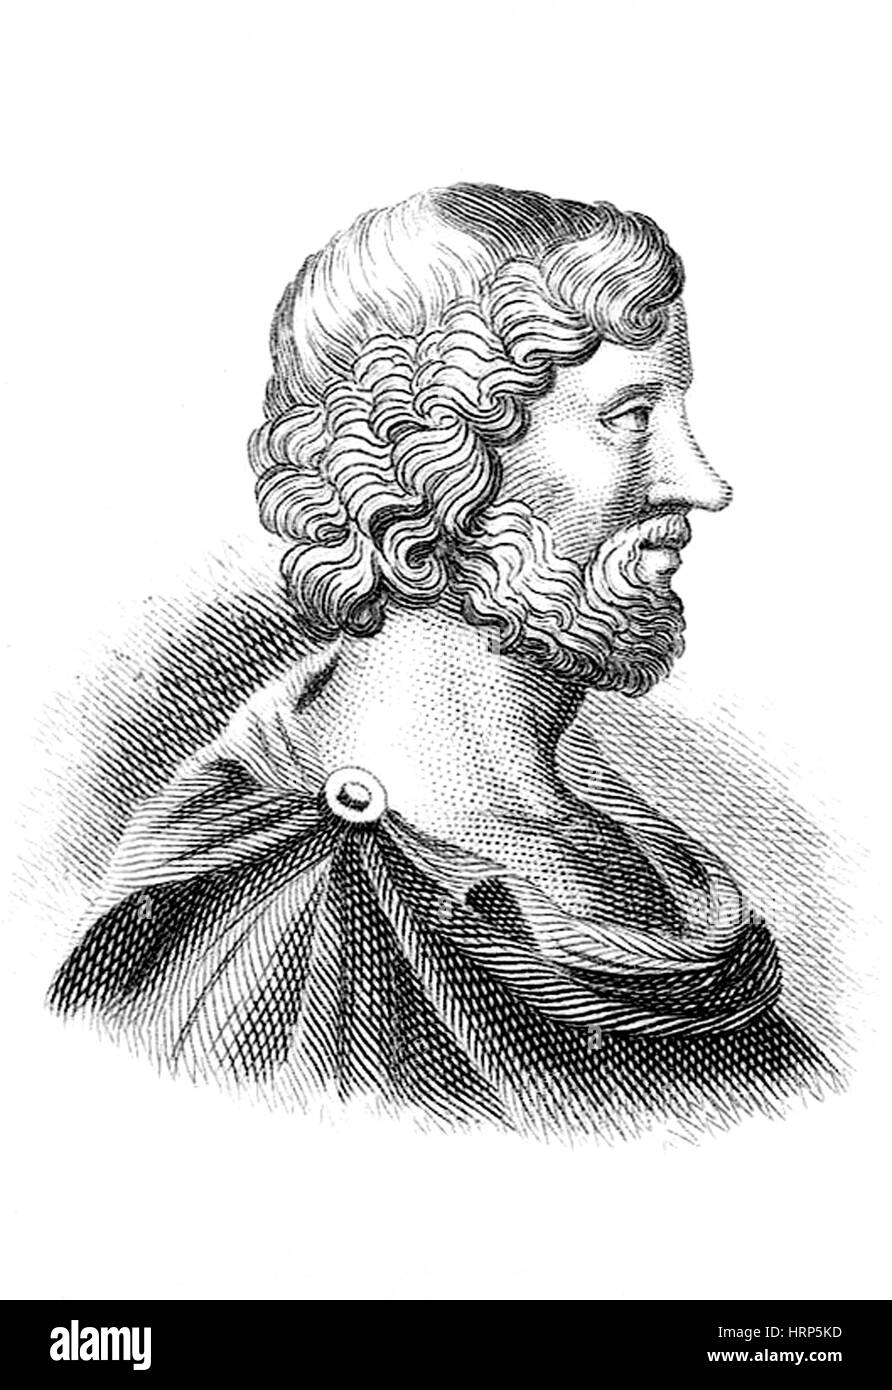 Aristippus of Cyrene, Ancient Greek Philosopher - Stock Image